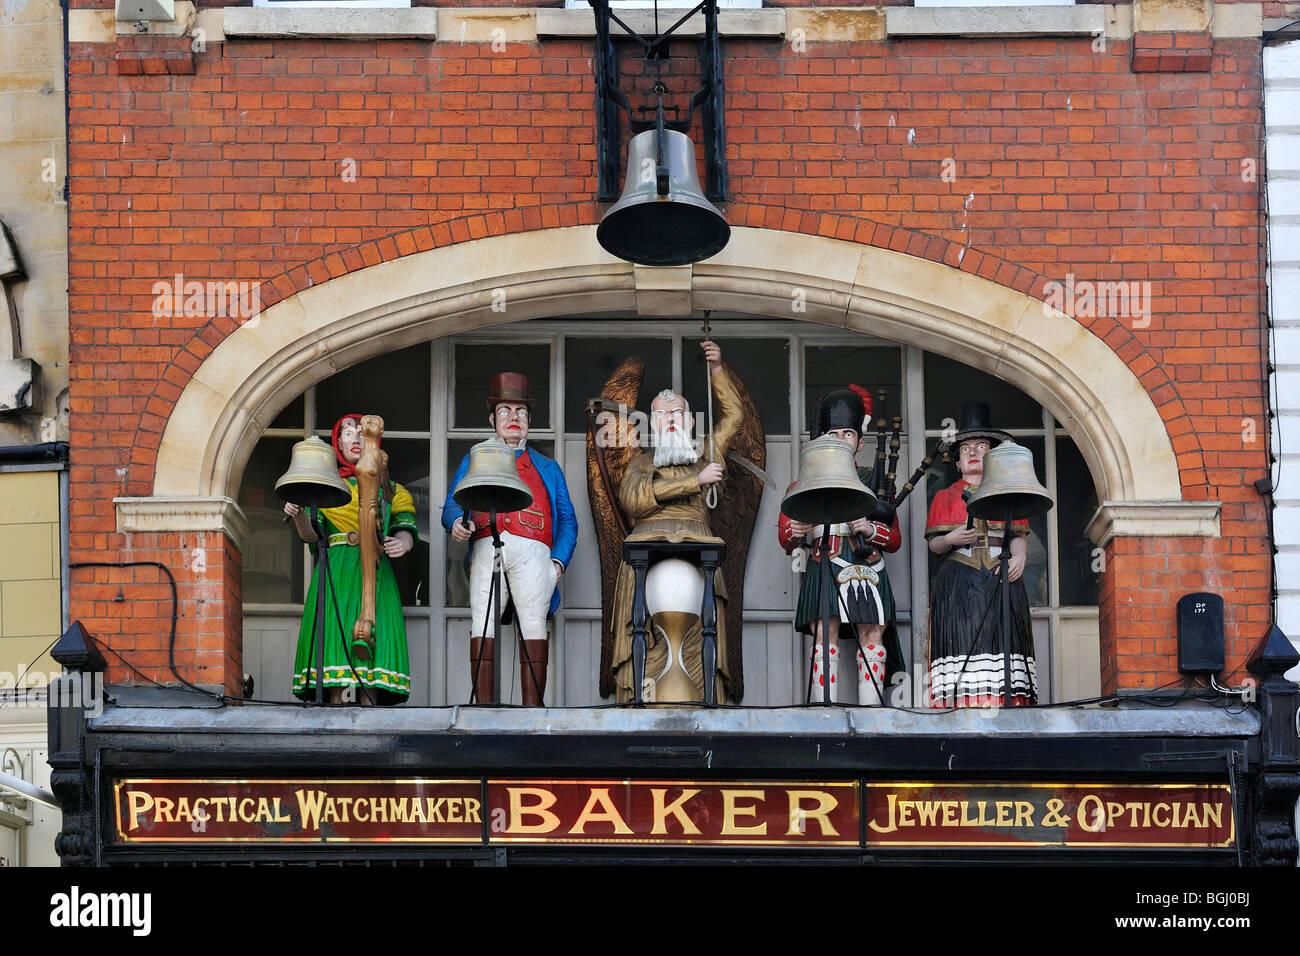 Baker's jeweller Shop in Gloucester - Stock Image